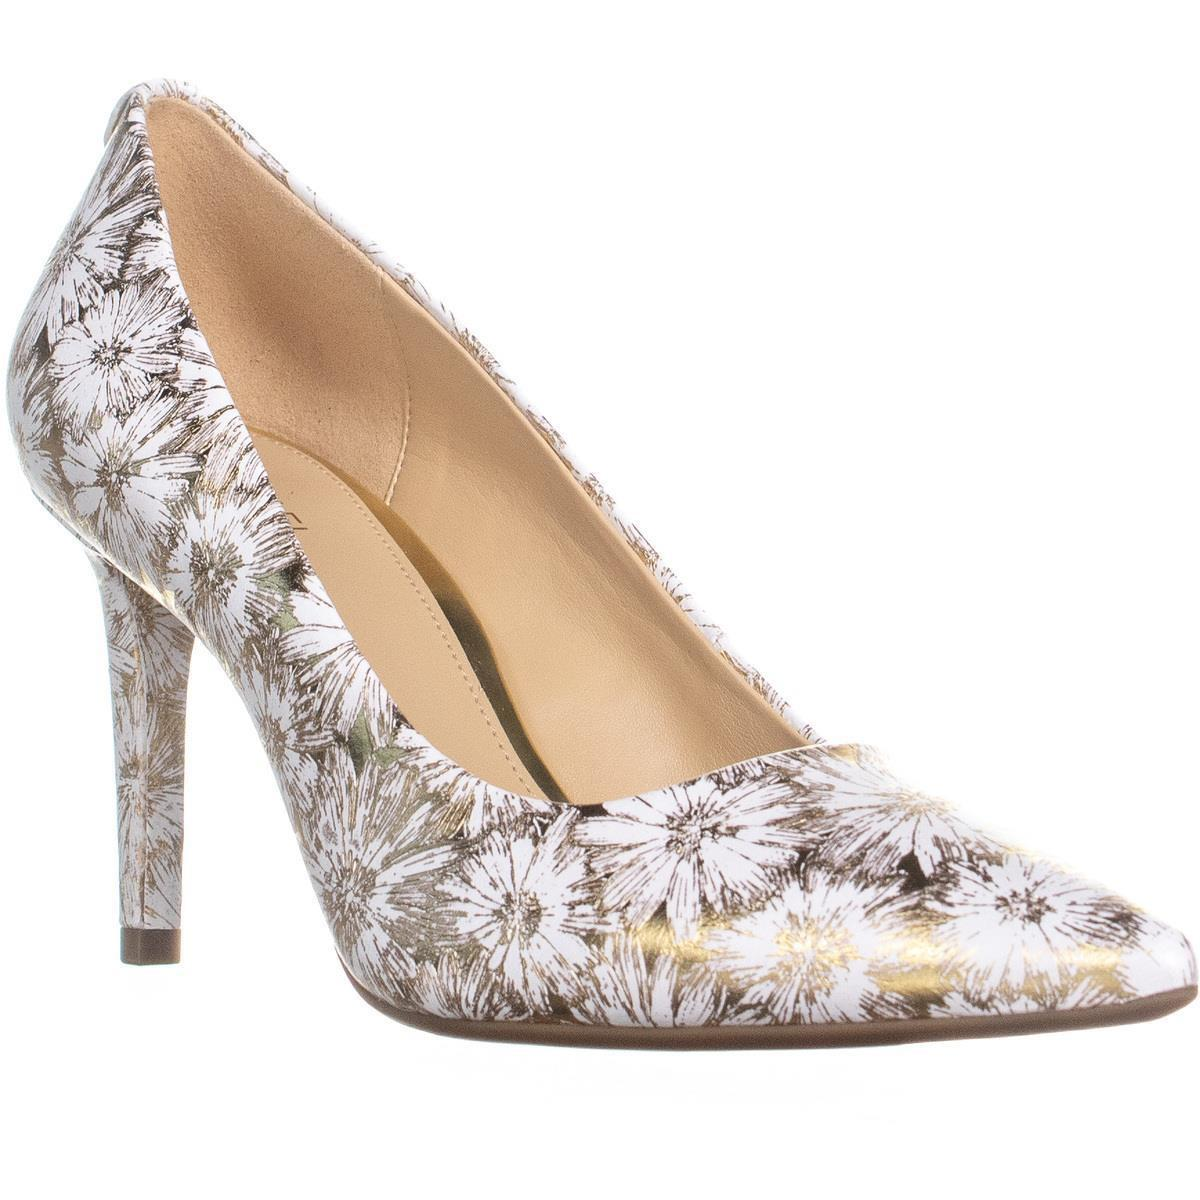 3f1c586c958e Lyst - Michael Kors Michael Dorothy Flex Pump Classic Heels in White